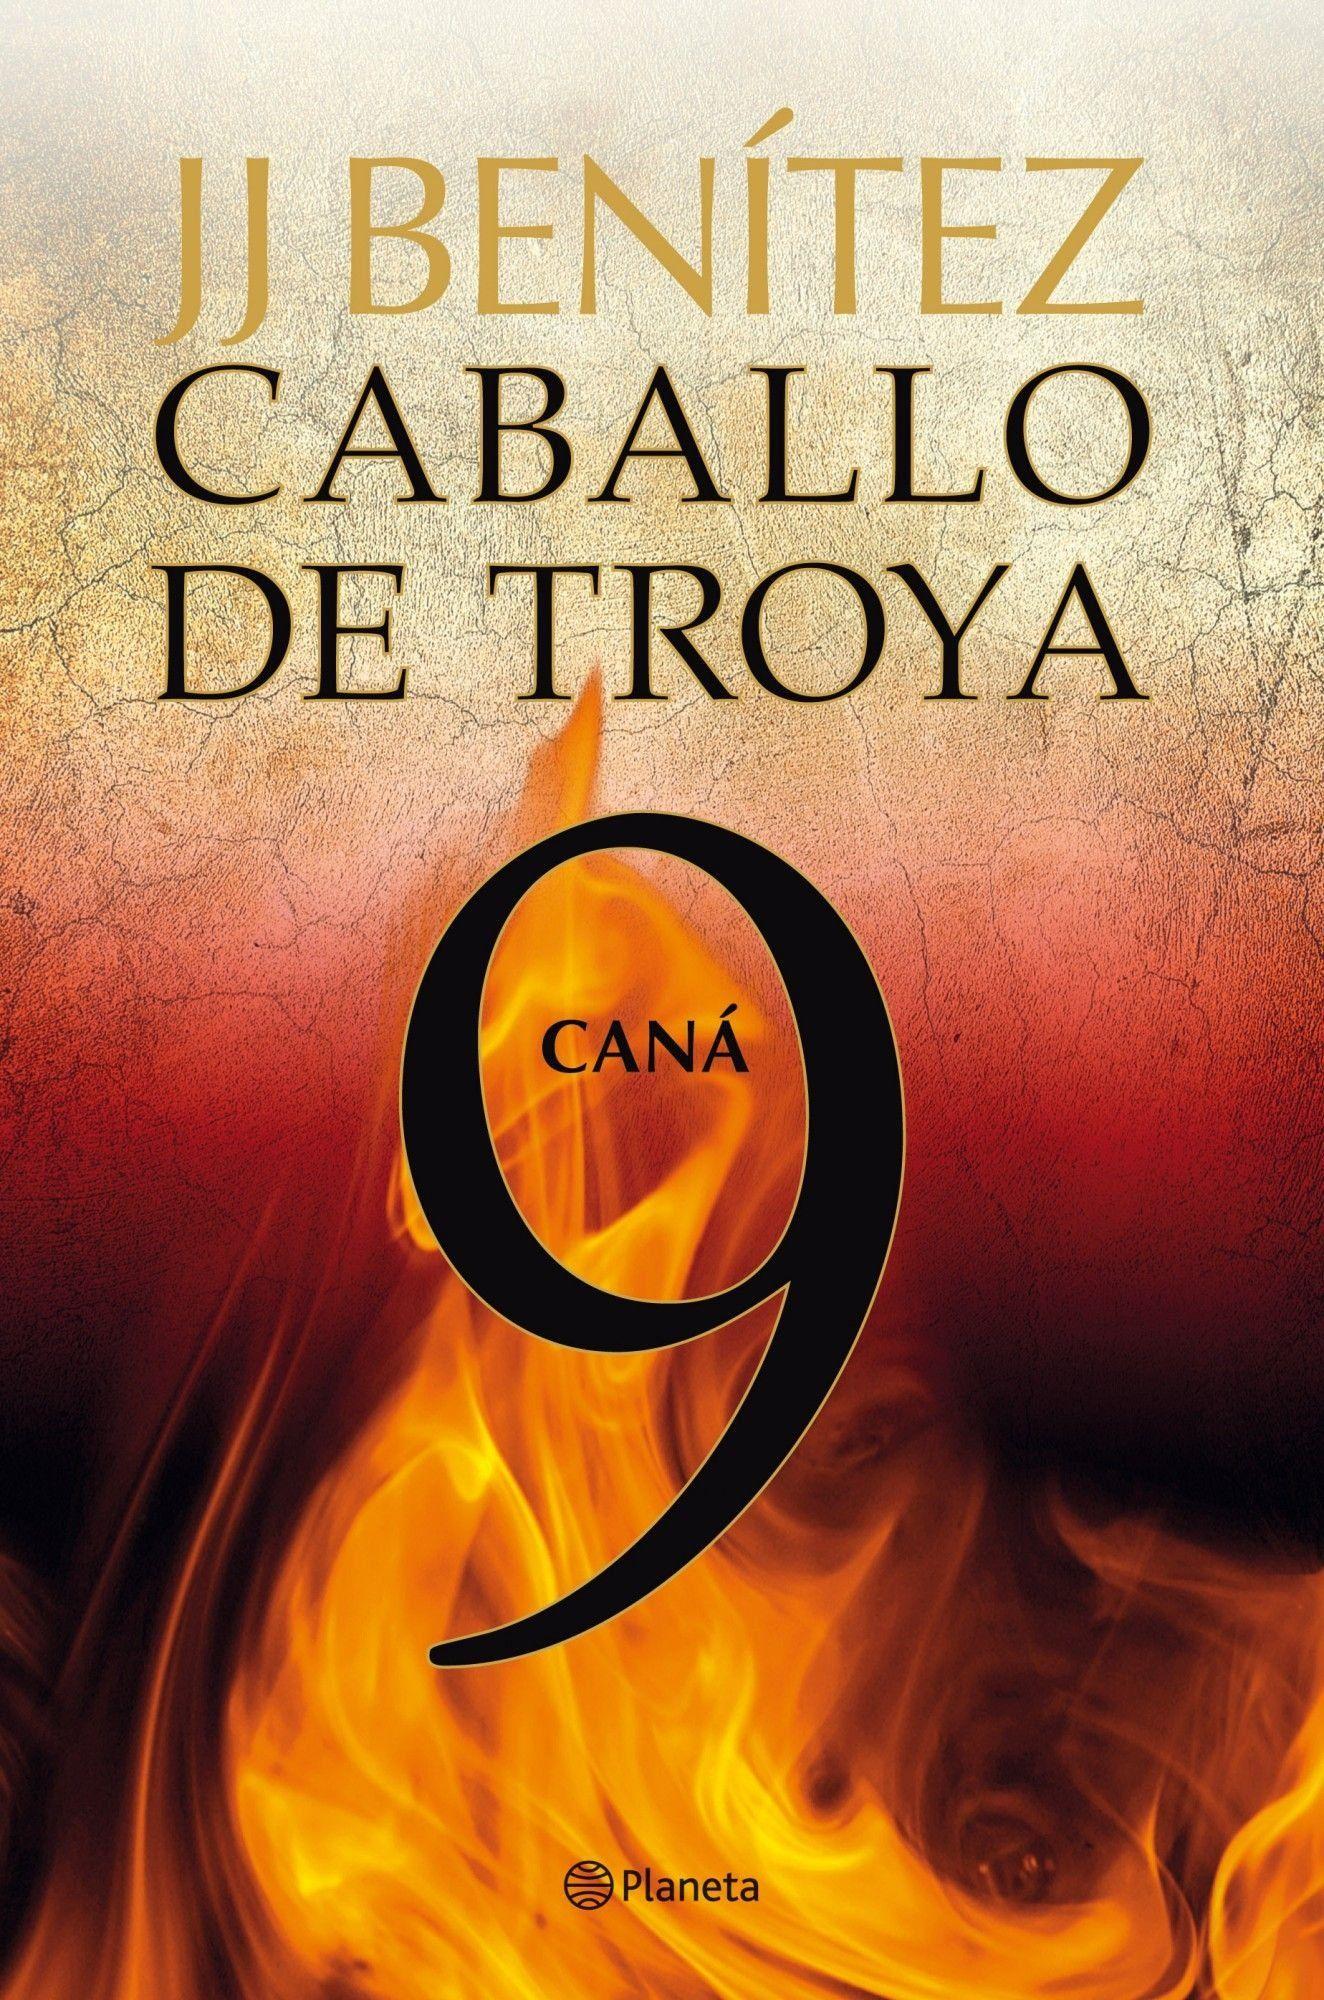 Can Caballo De Troya 9 Biblioteca J J Ben ªtez Troya De